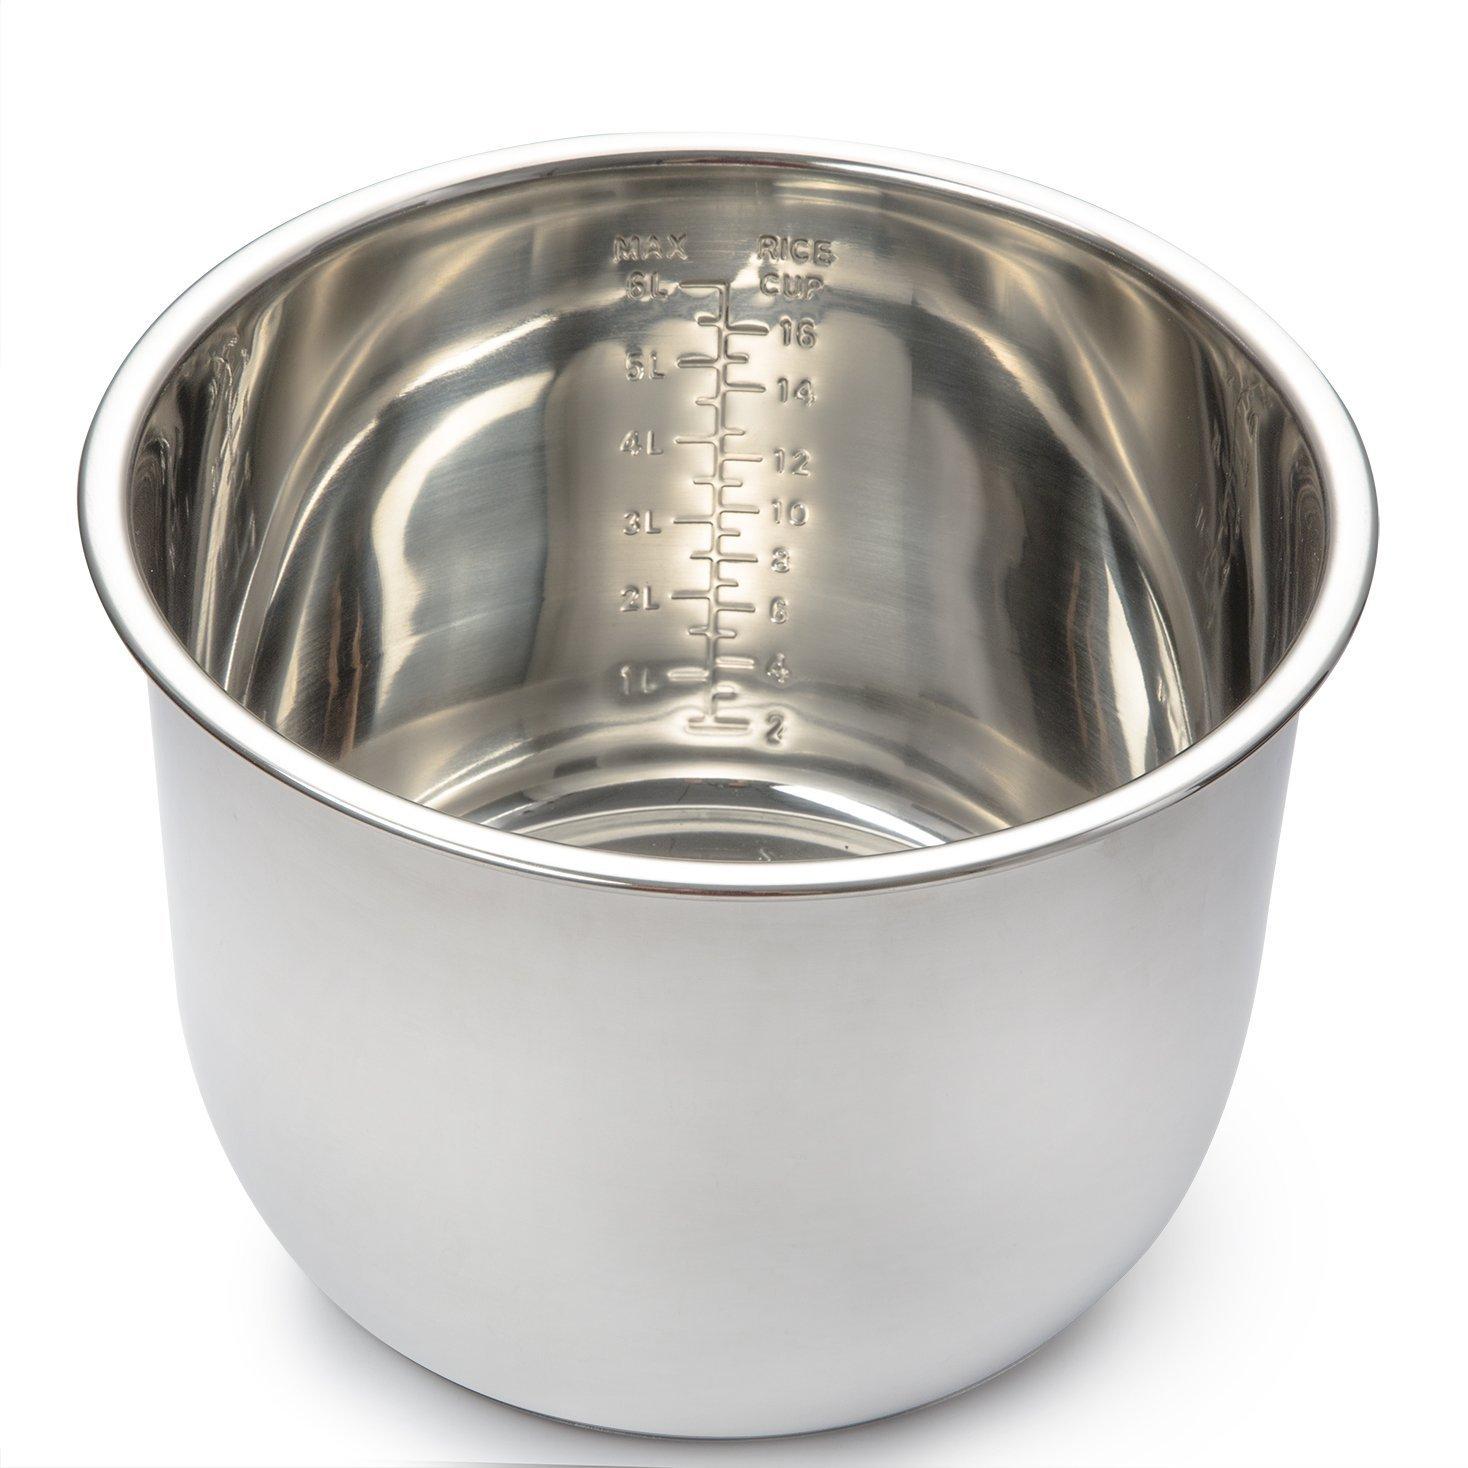 COSORI Stainless Steel Inner Pot for 8 Quart Premium Pressure Cooker